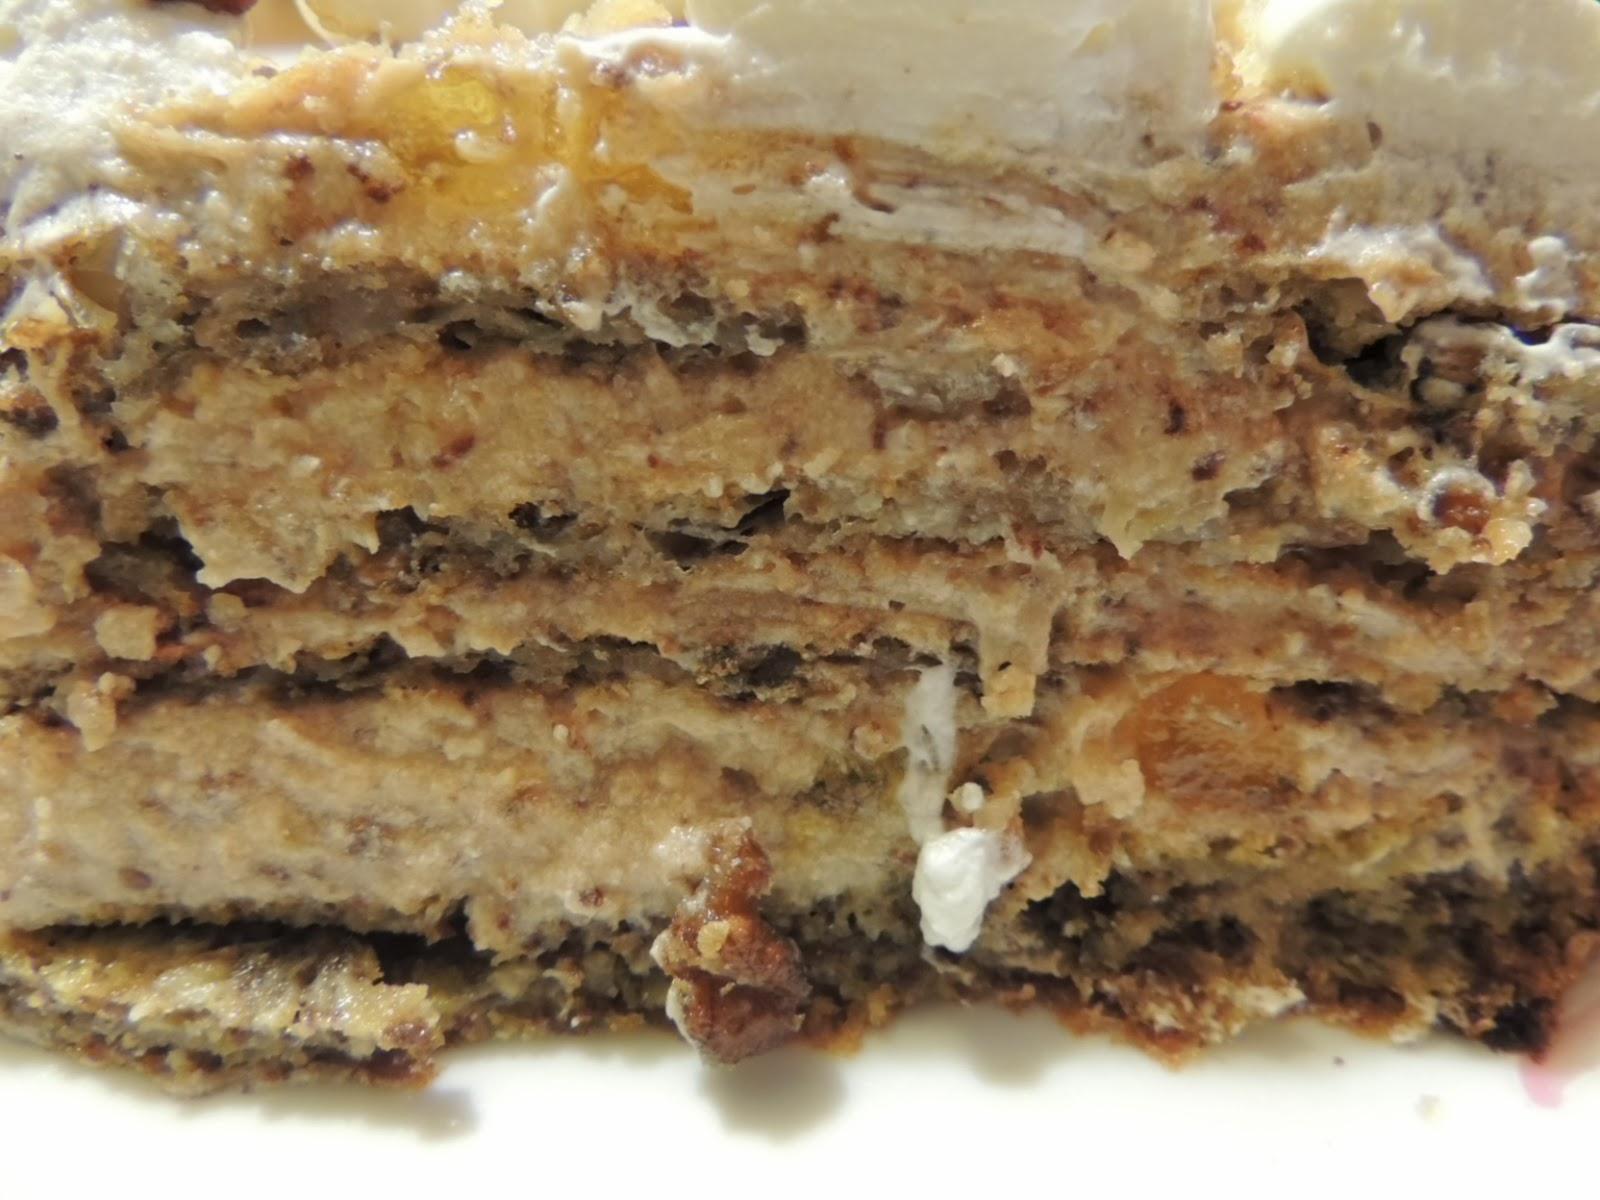 Torta sa tri socne kore